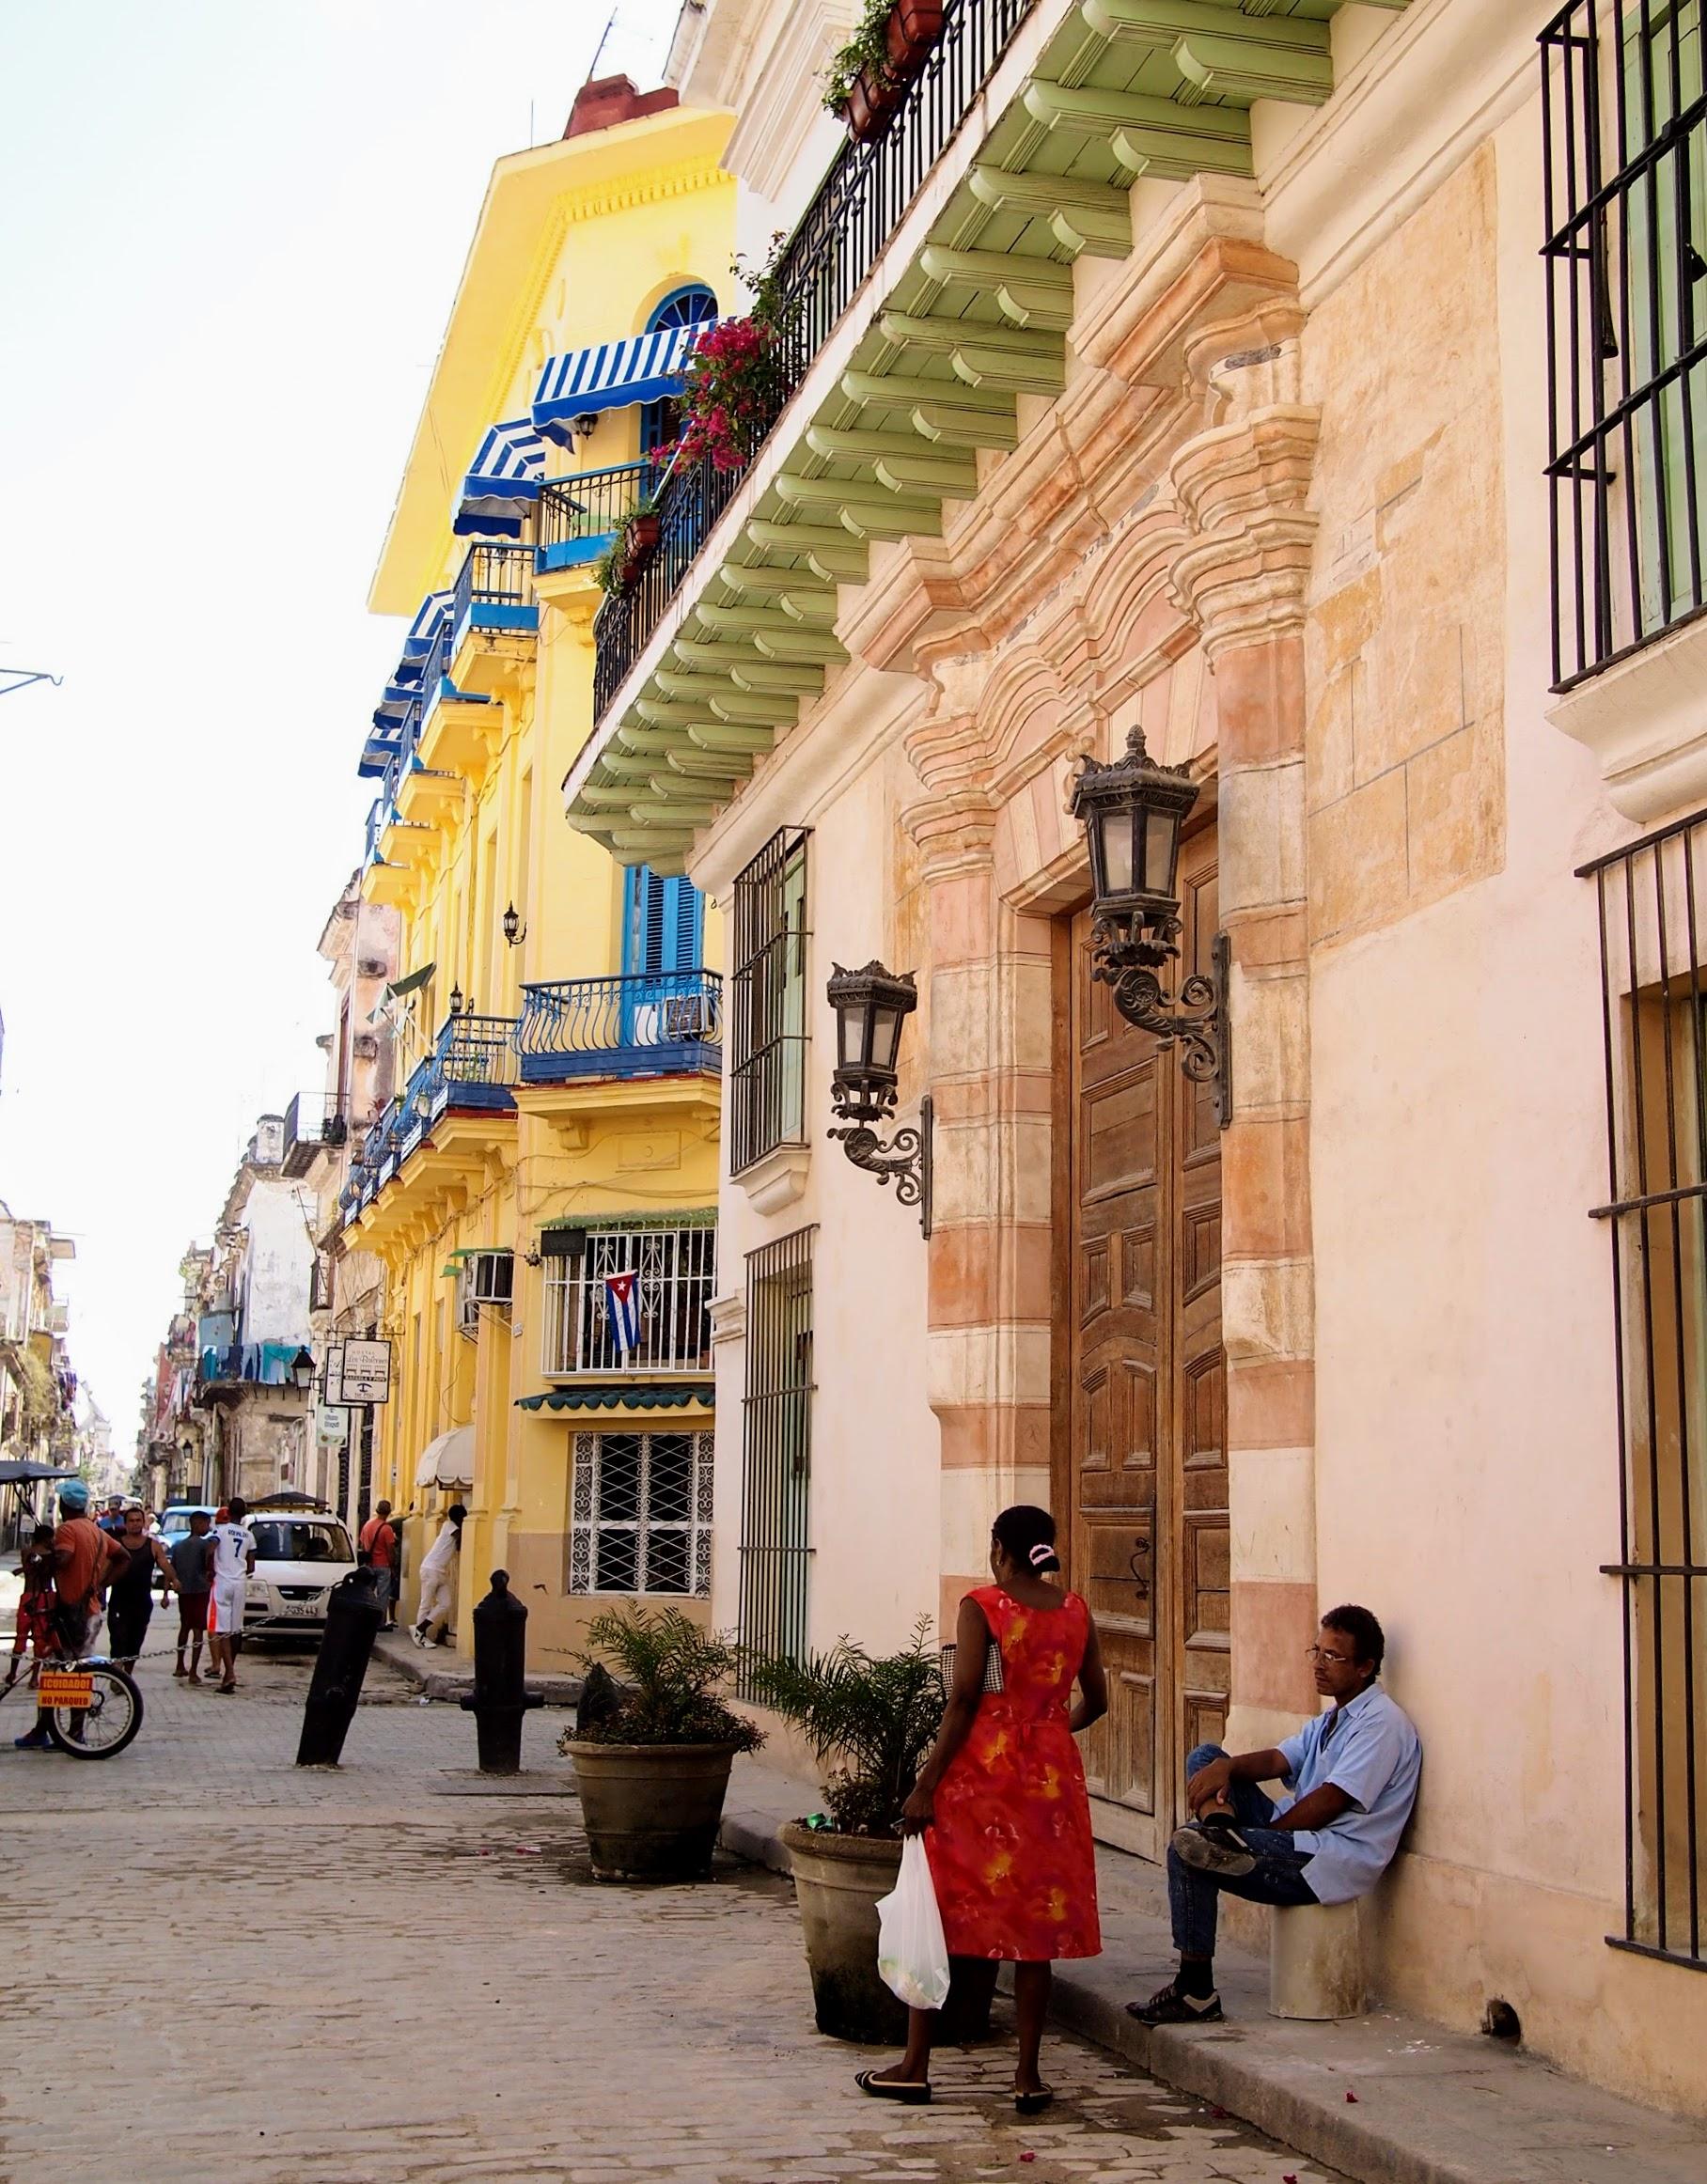 Street scenes around Plaza Vieja